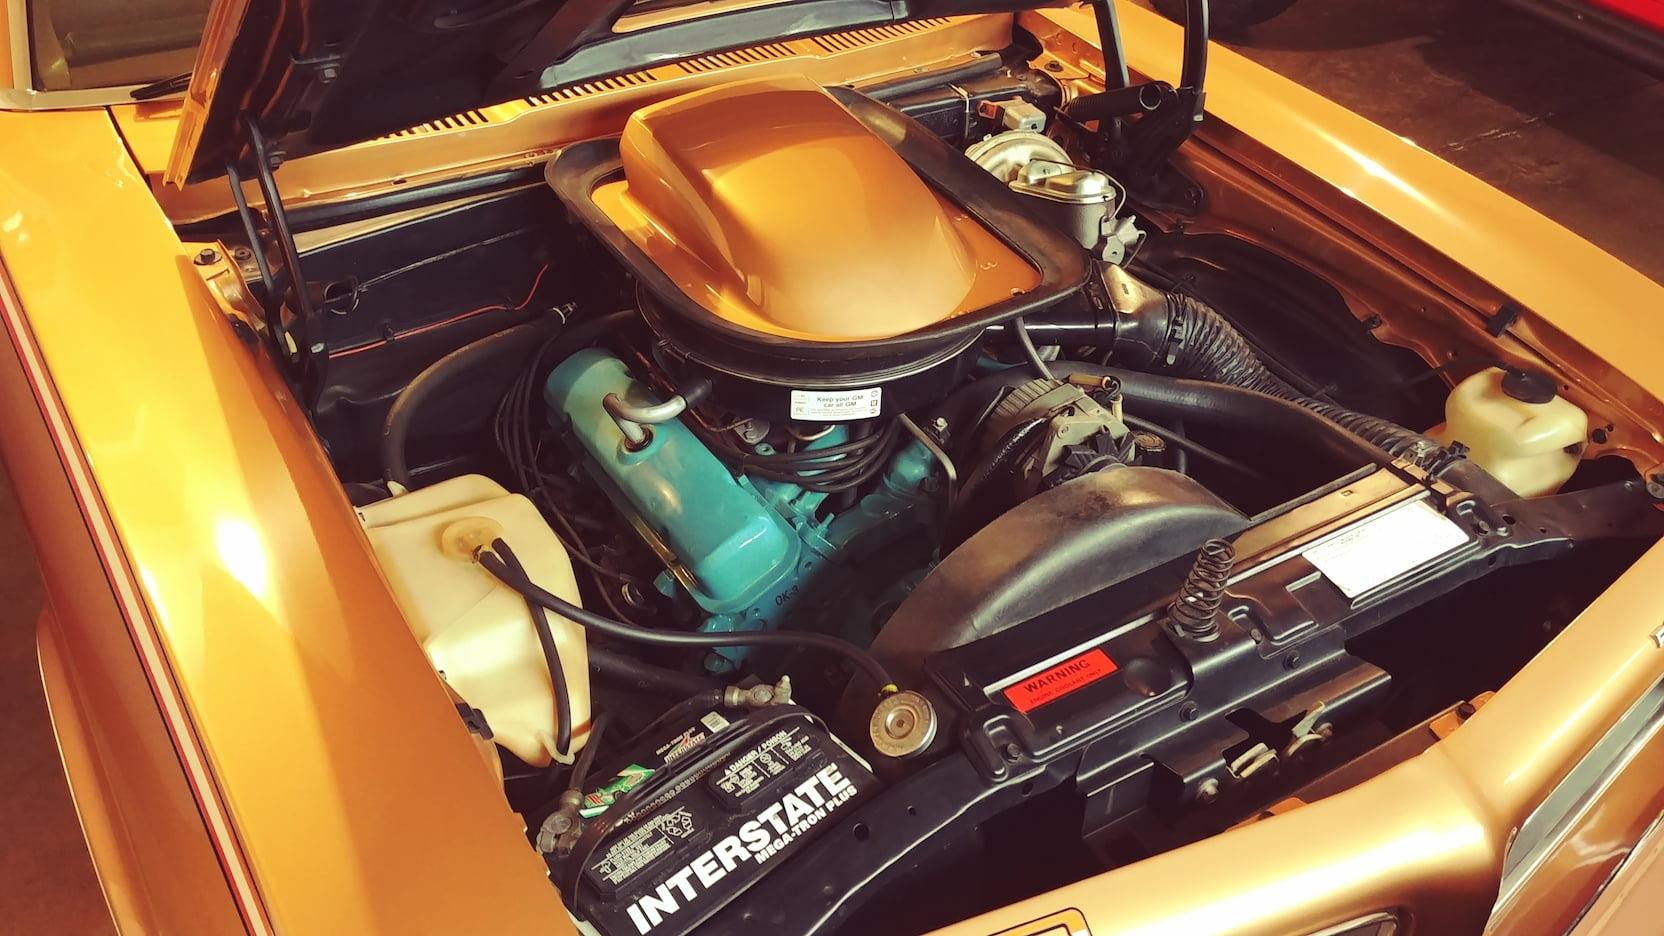 1974 Pontiac GTO shaker hood engine